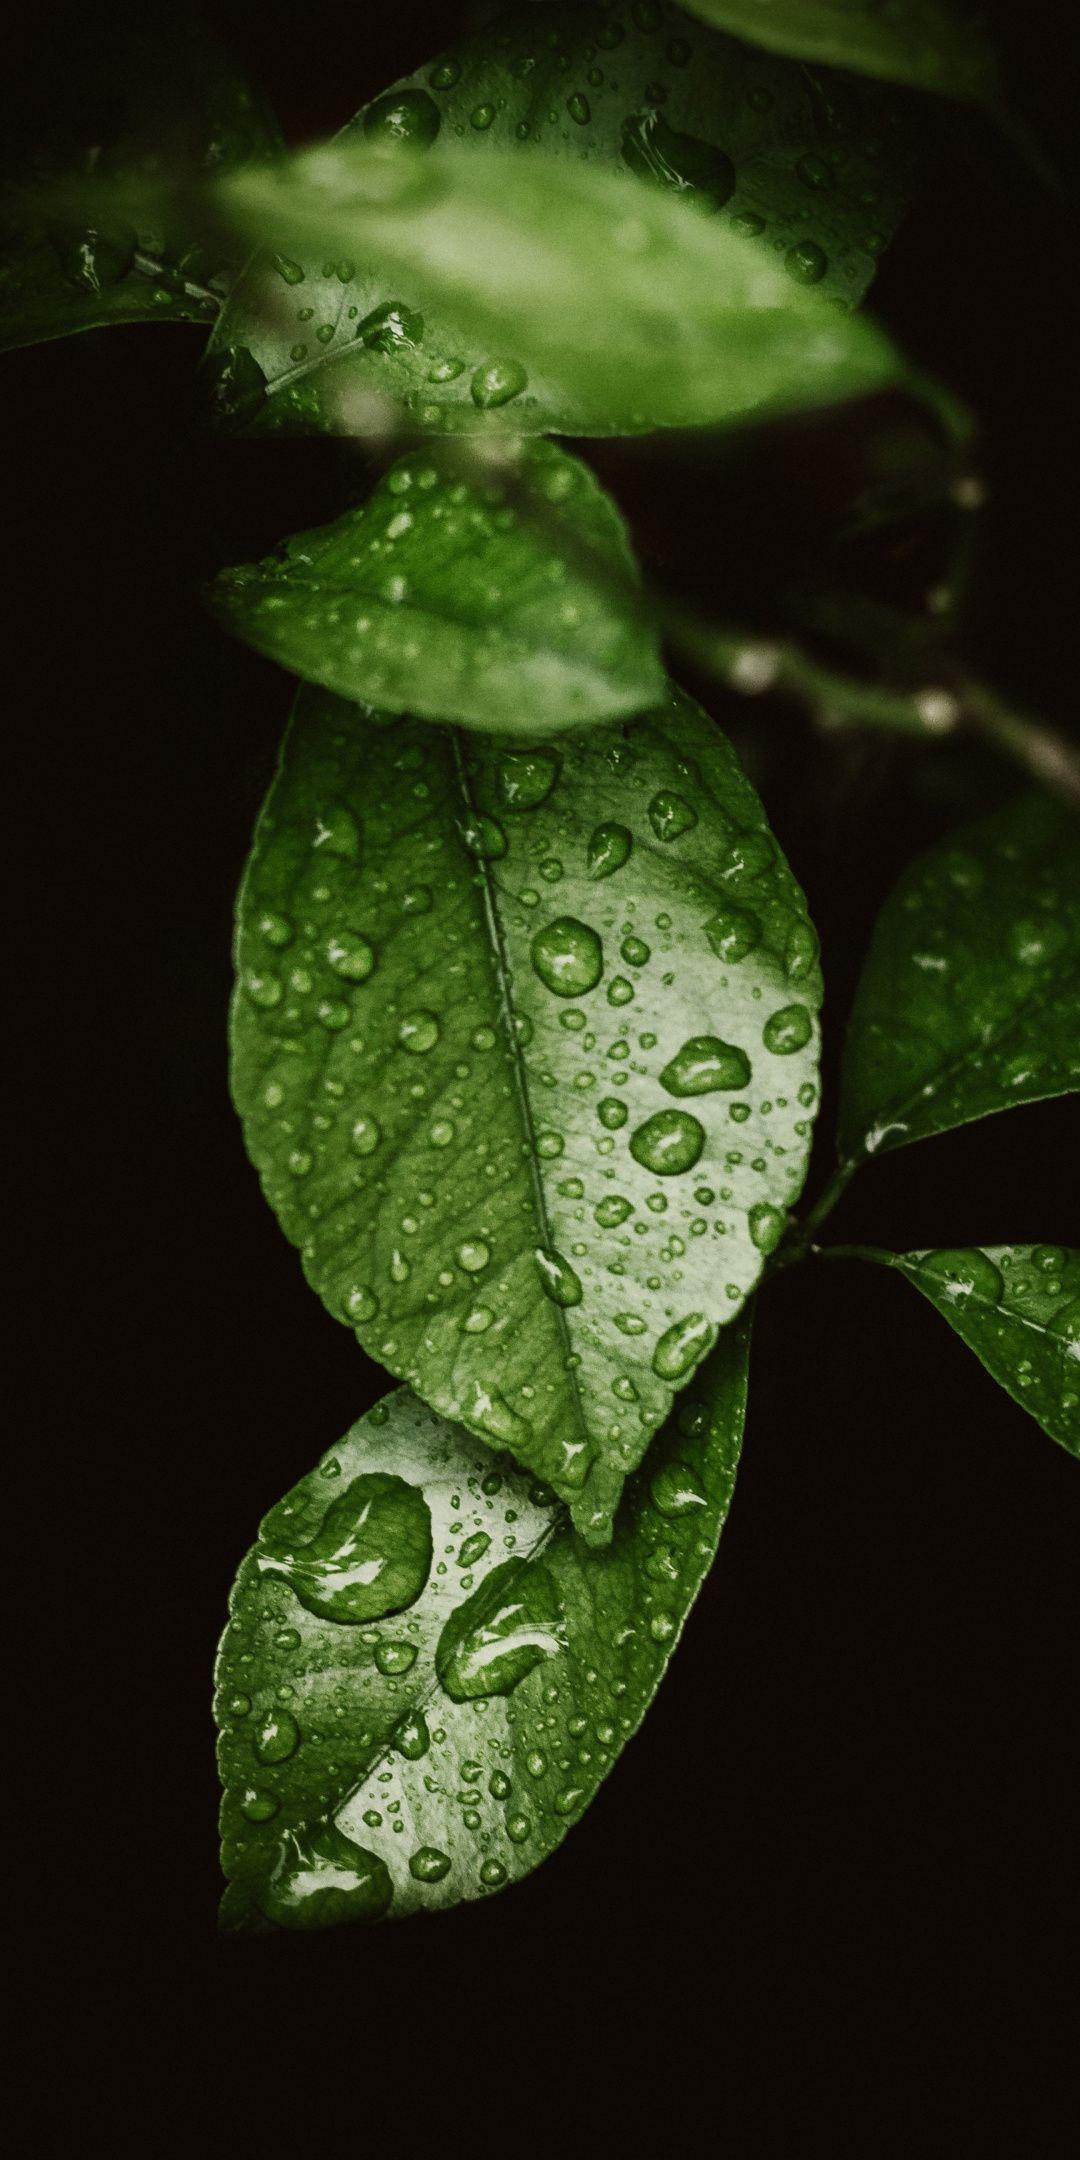 1080x2160 Drops On Leaf Macro Wallpaper Leaf Photography Water Droplets Photography Nature Wallpaper